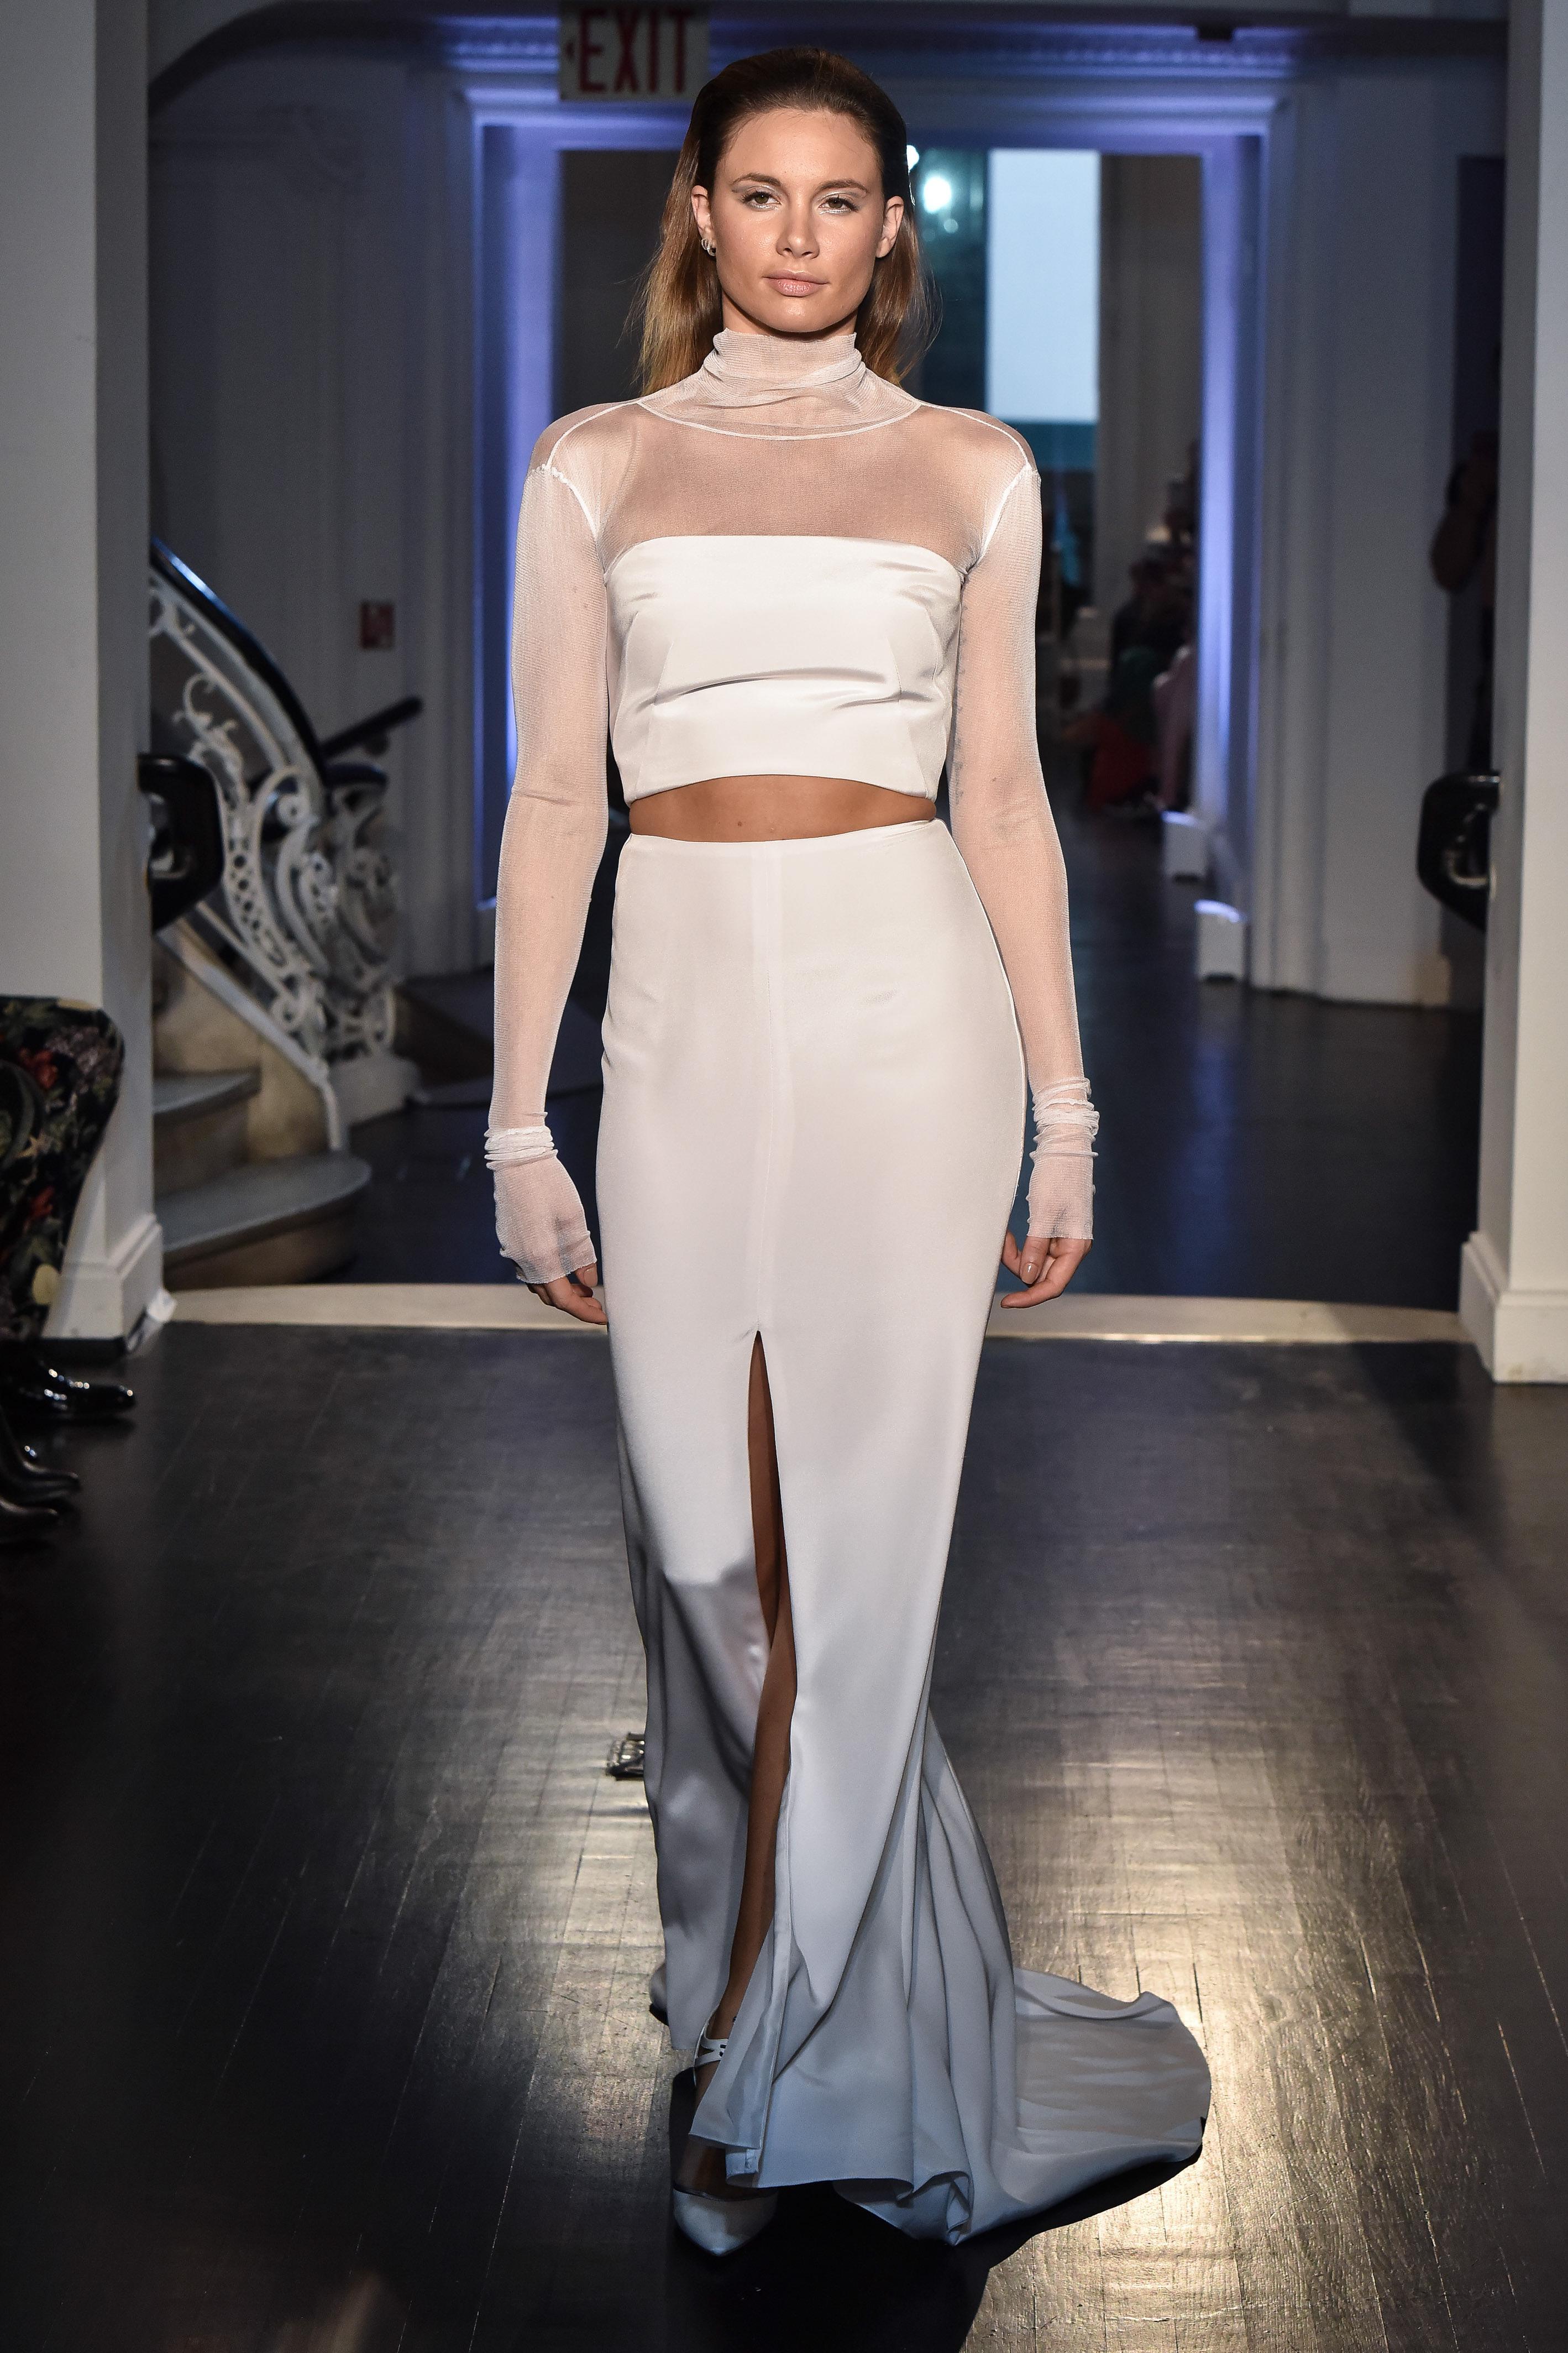 lakum wedding dress fall 2018 separates long sleeve illusion